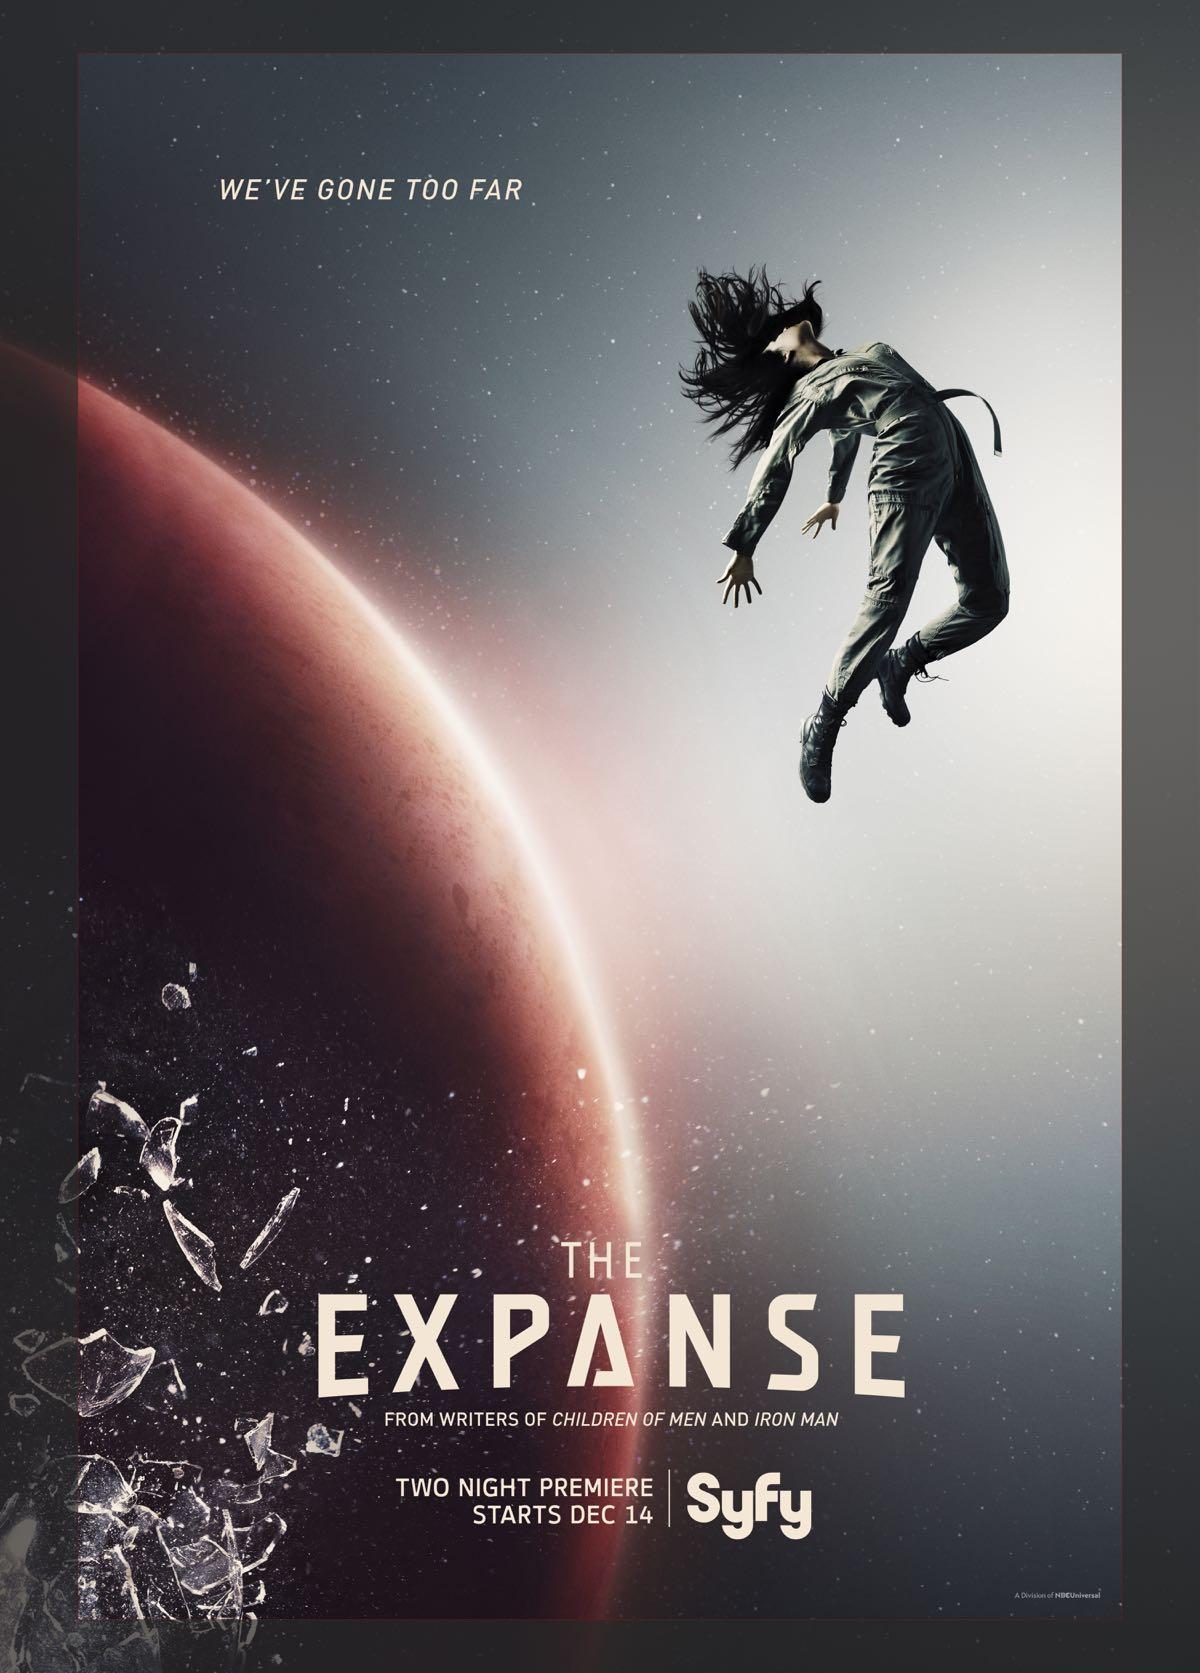 The Expanse Syfy